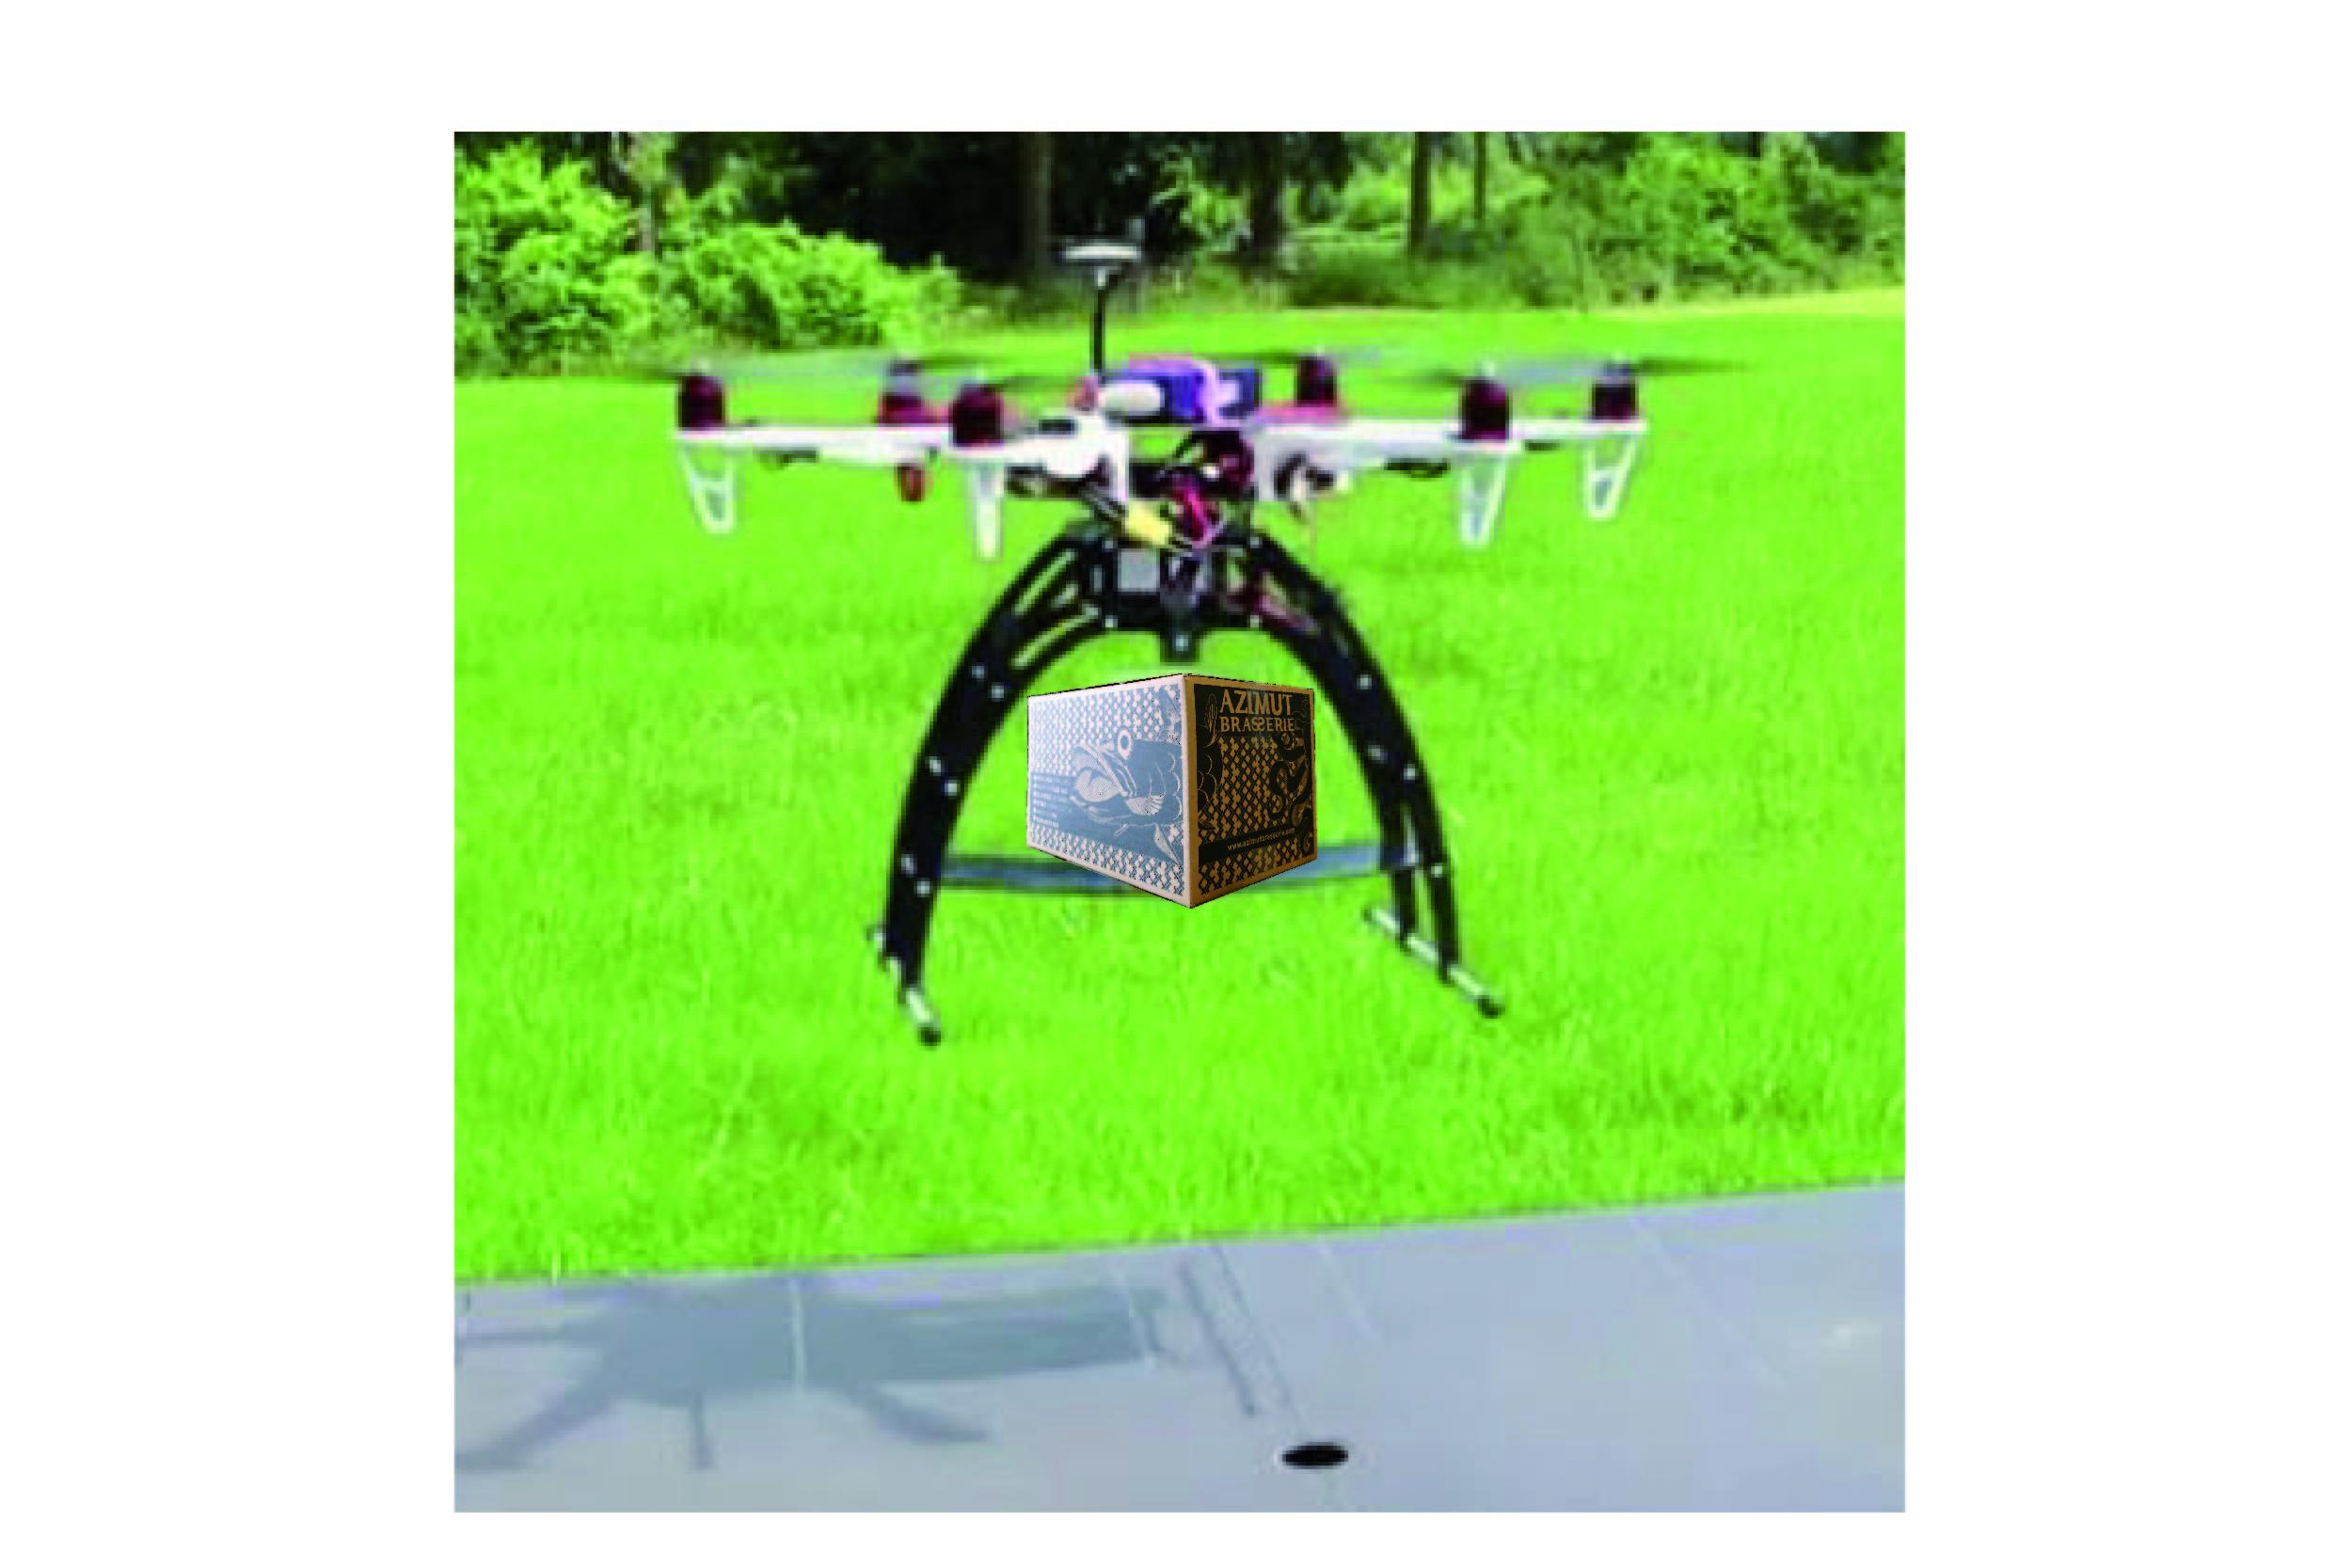 drone__1_-1496933763.jpg